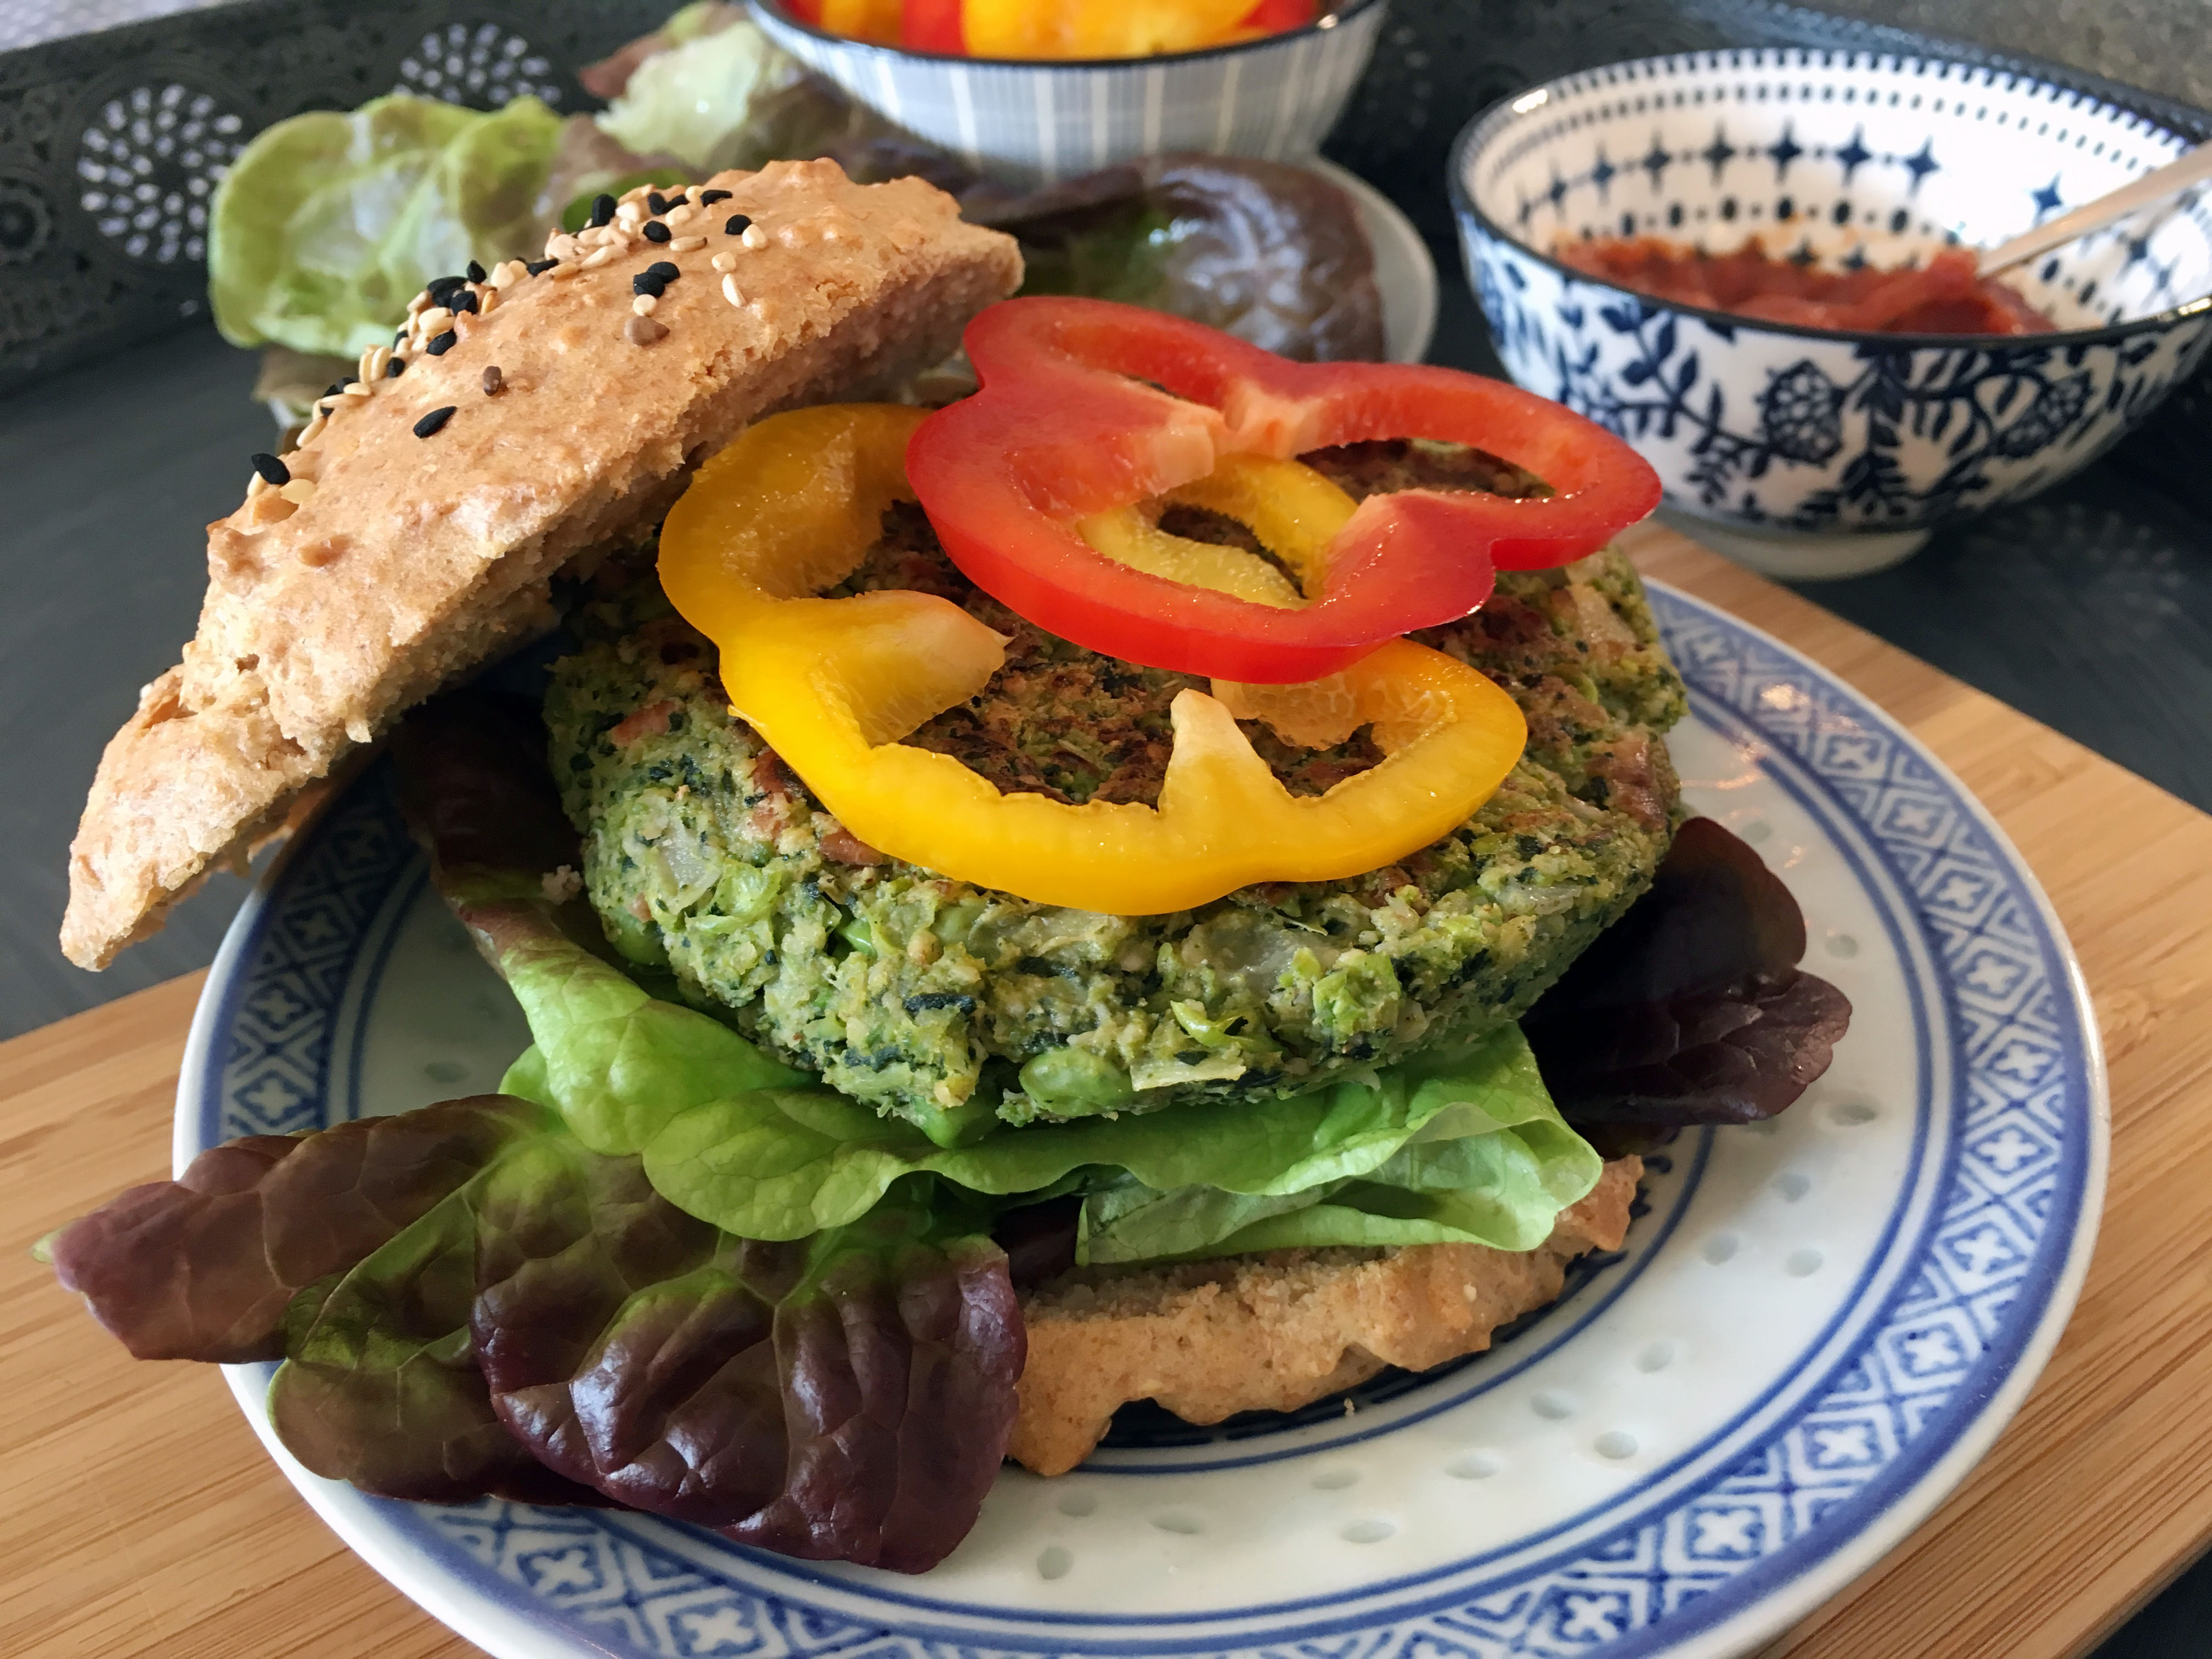 Vegan Broccoli Burger Patty The Histamine Friendly Kitchen